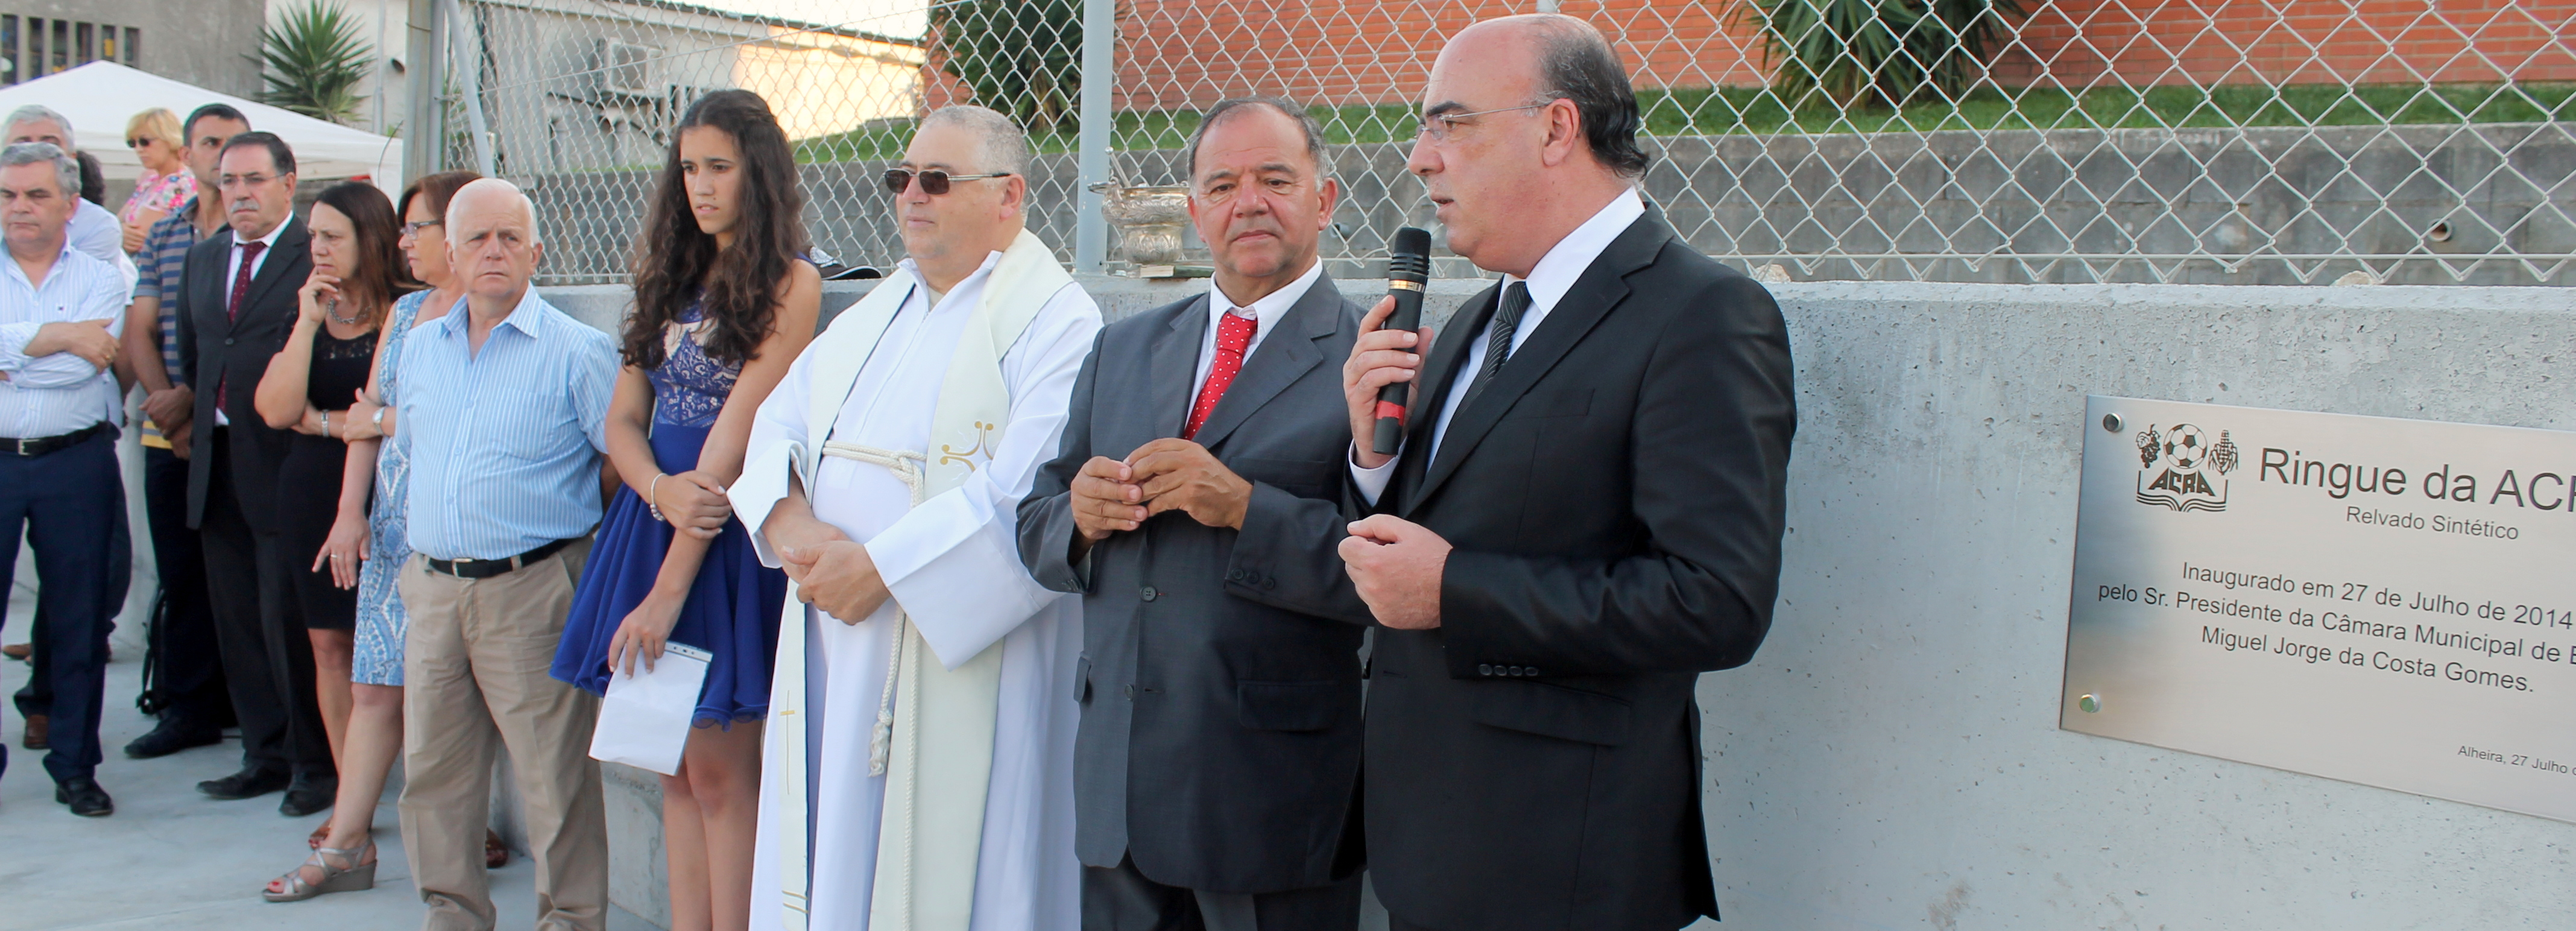 Alheira inaugurou ringue desportivo